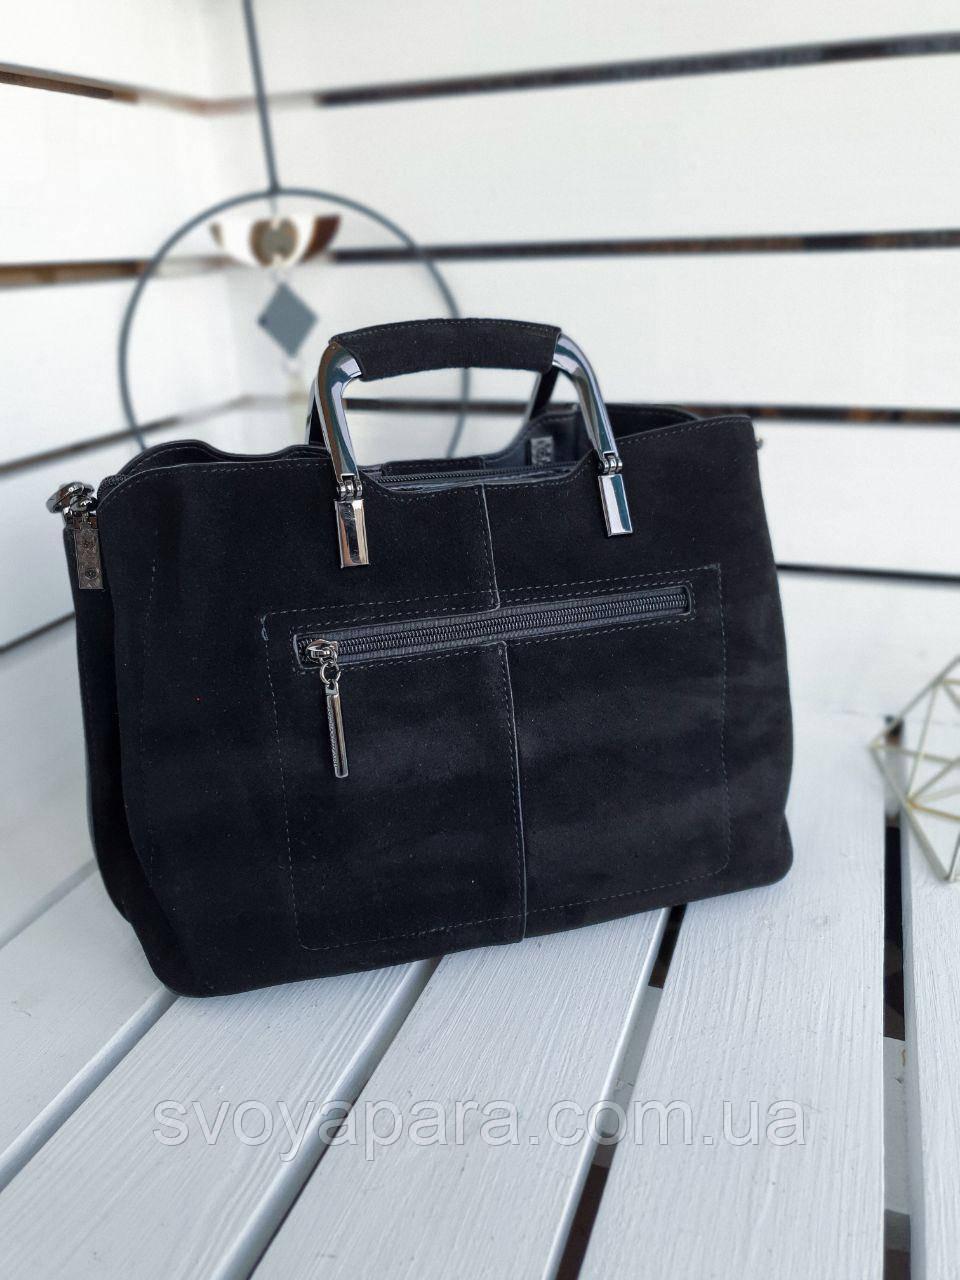 Кожаная/замшевая женская сумка размером 30х19х15 см Черная (01272)